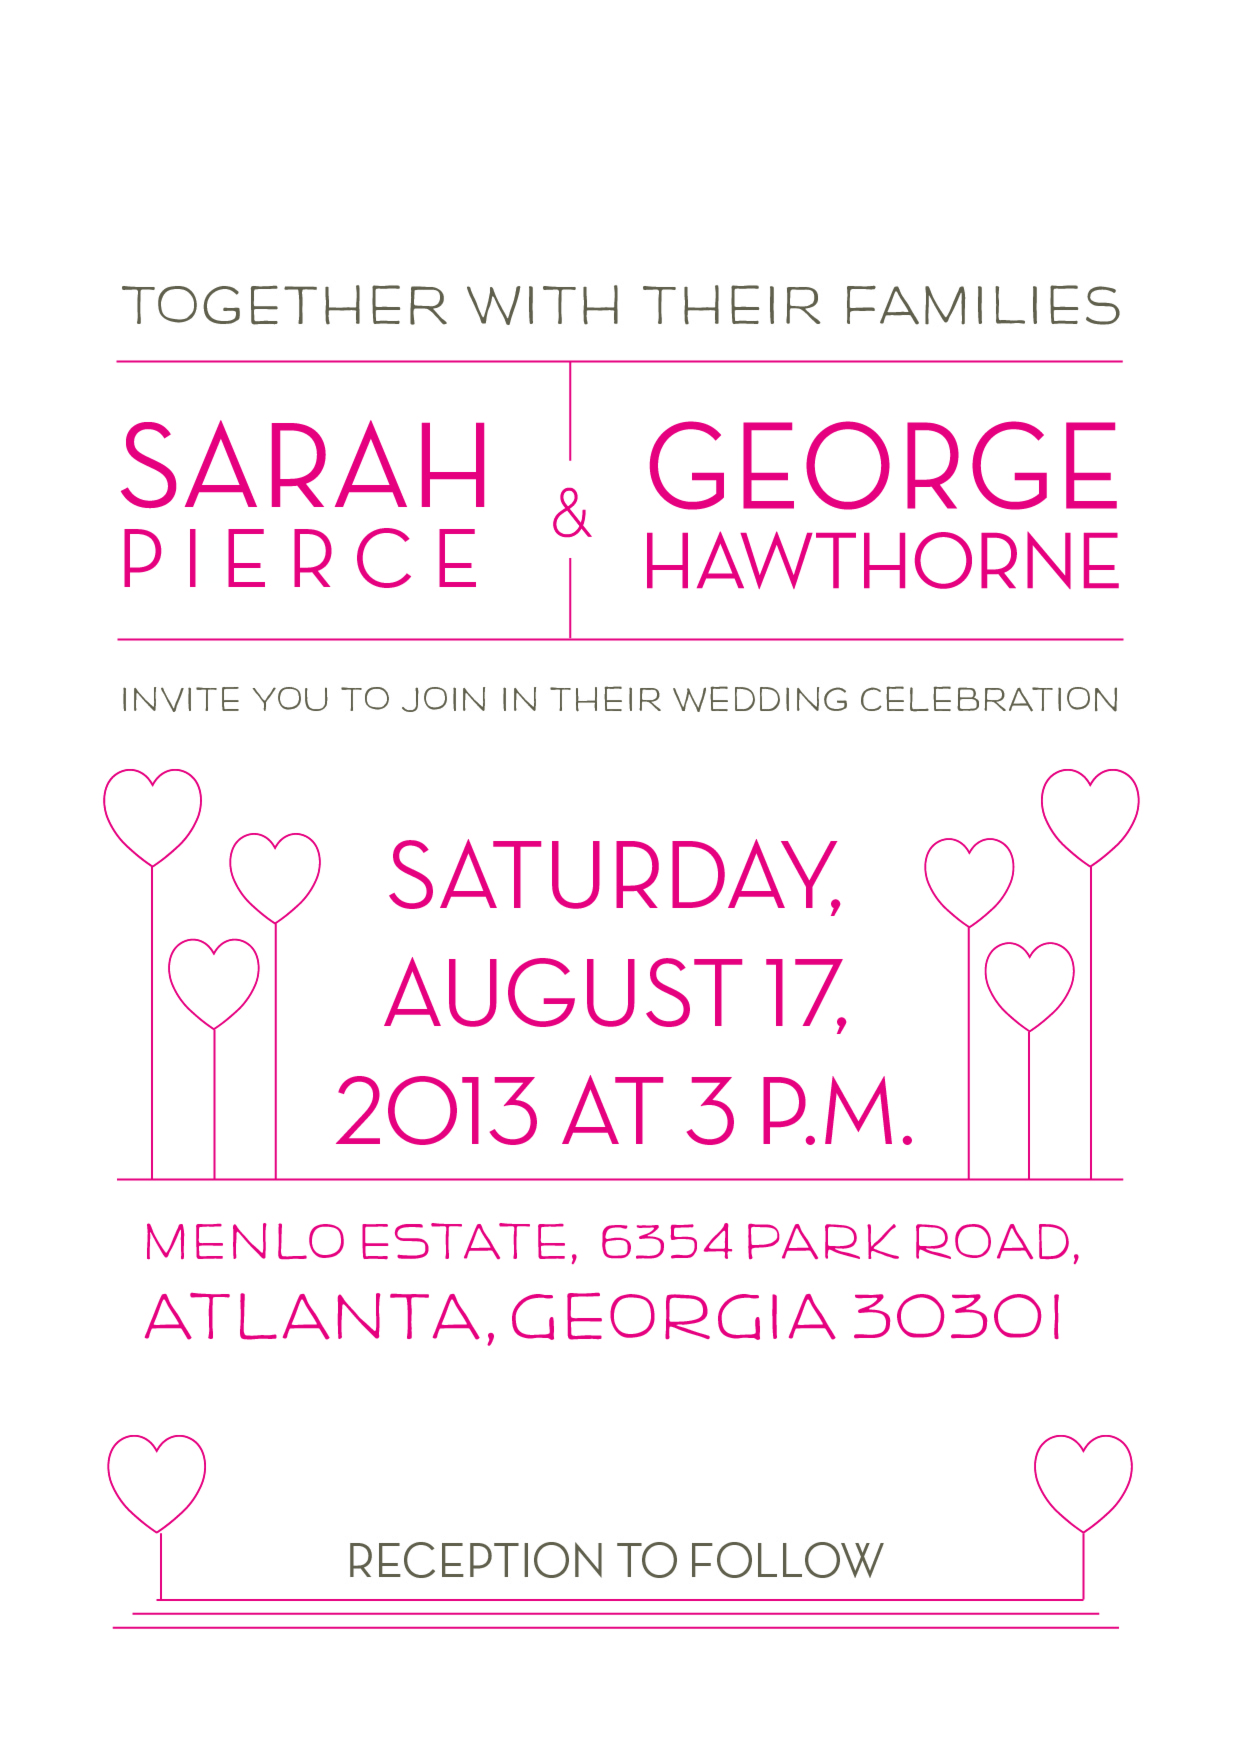 Sample Family Wedding Invitation - wikiHow | wedding ideas ...